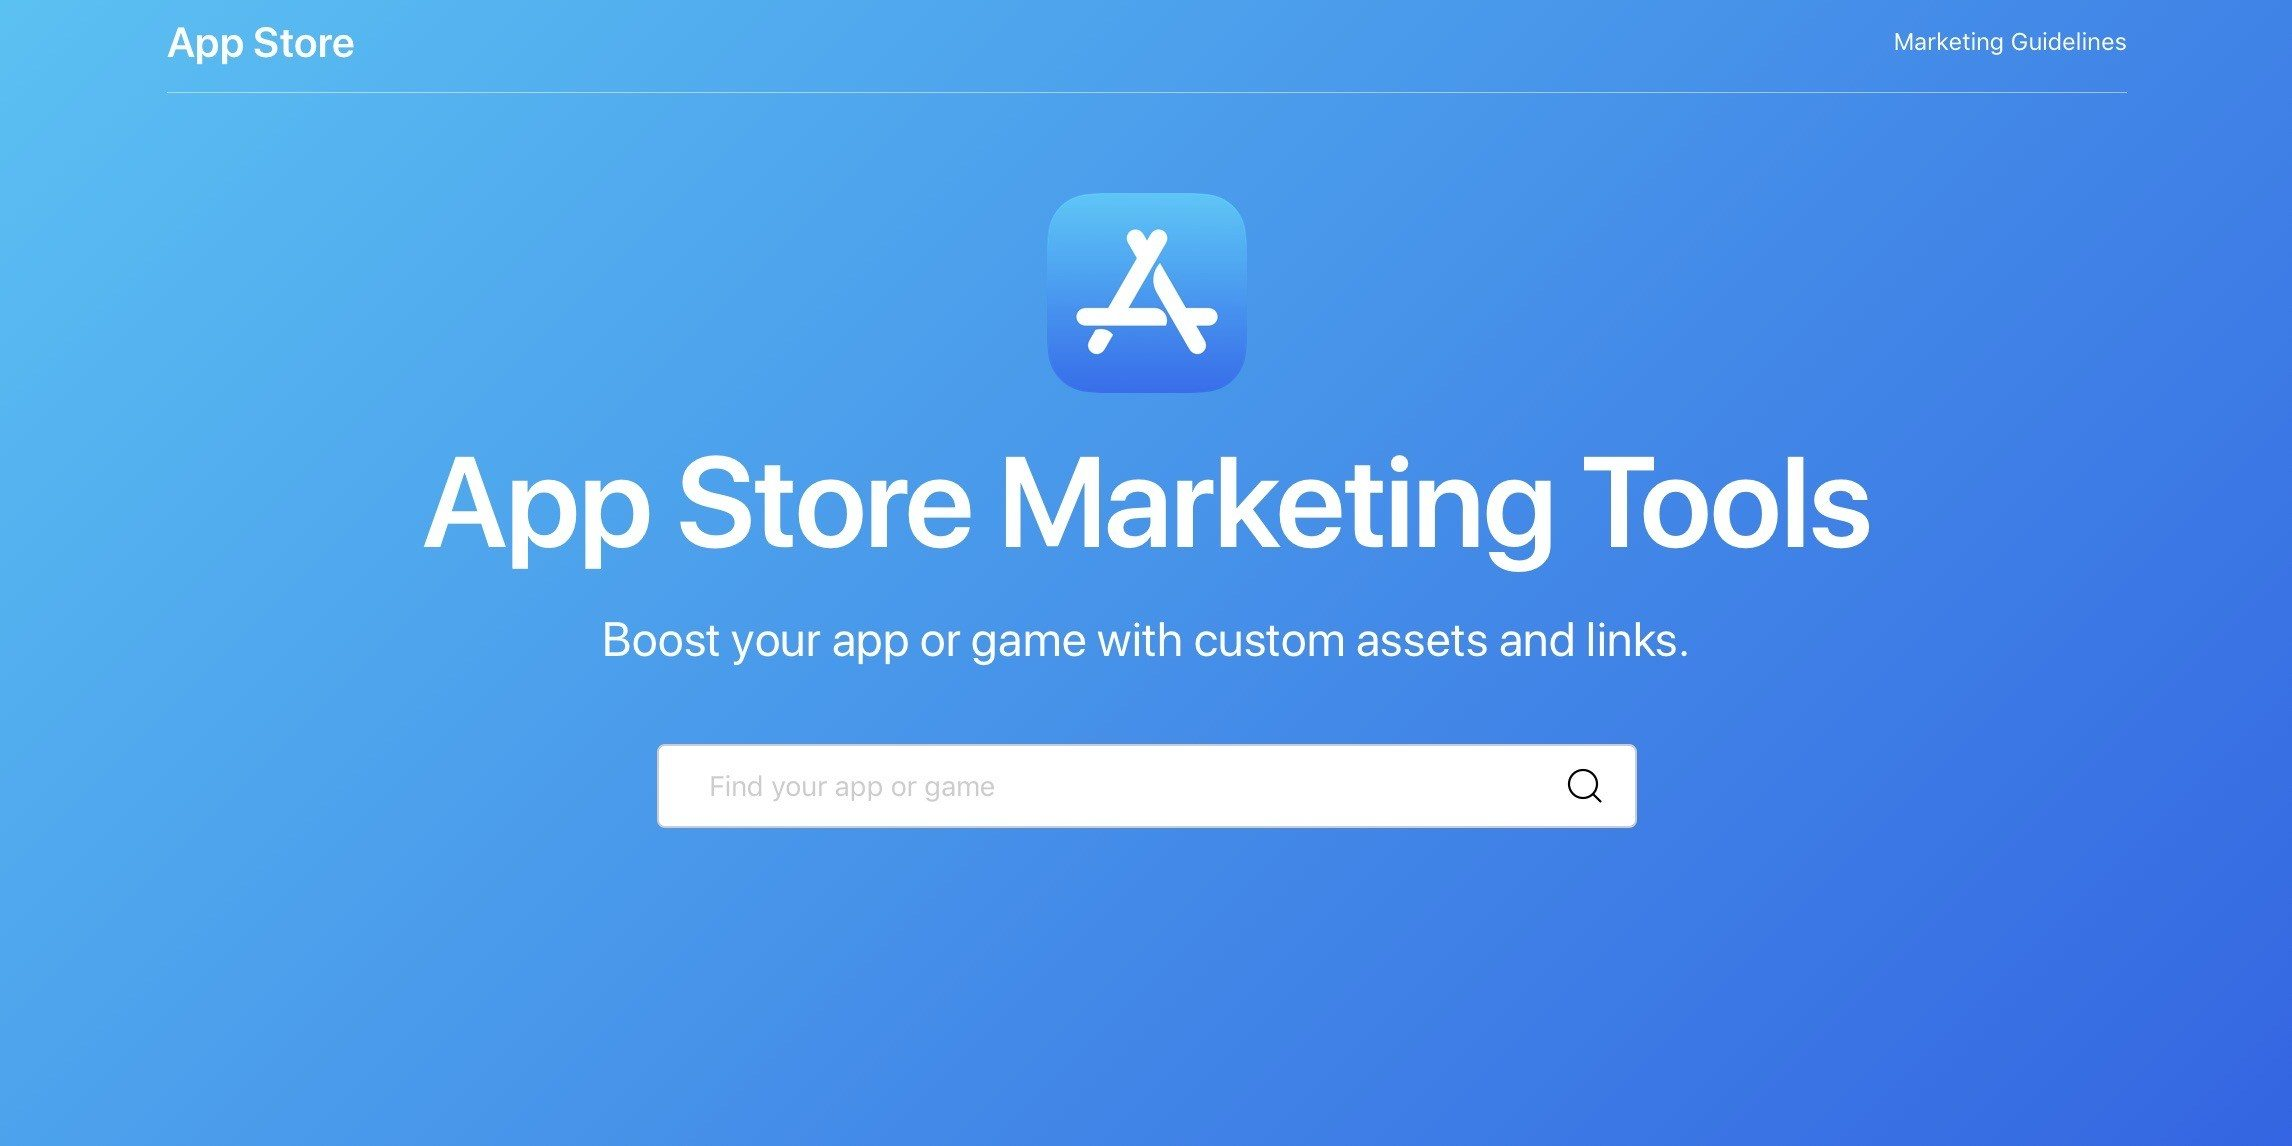 App Store Marketing Tools